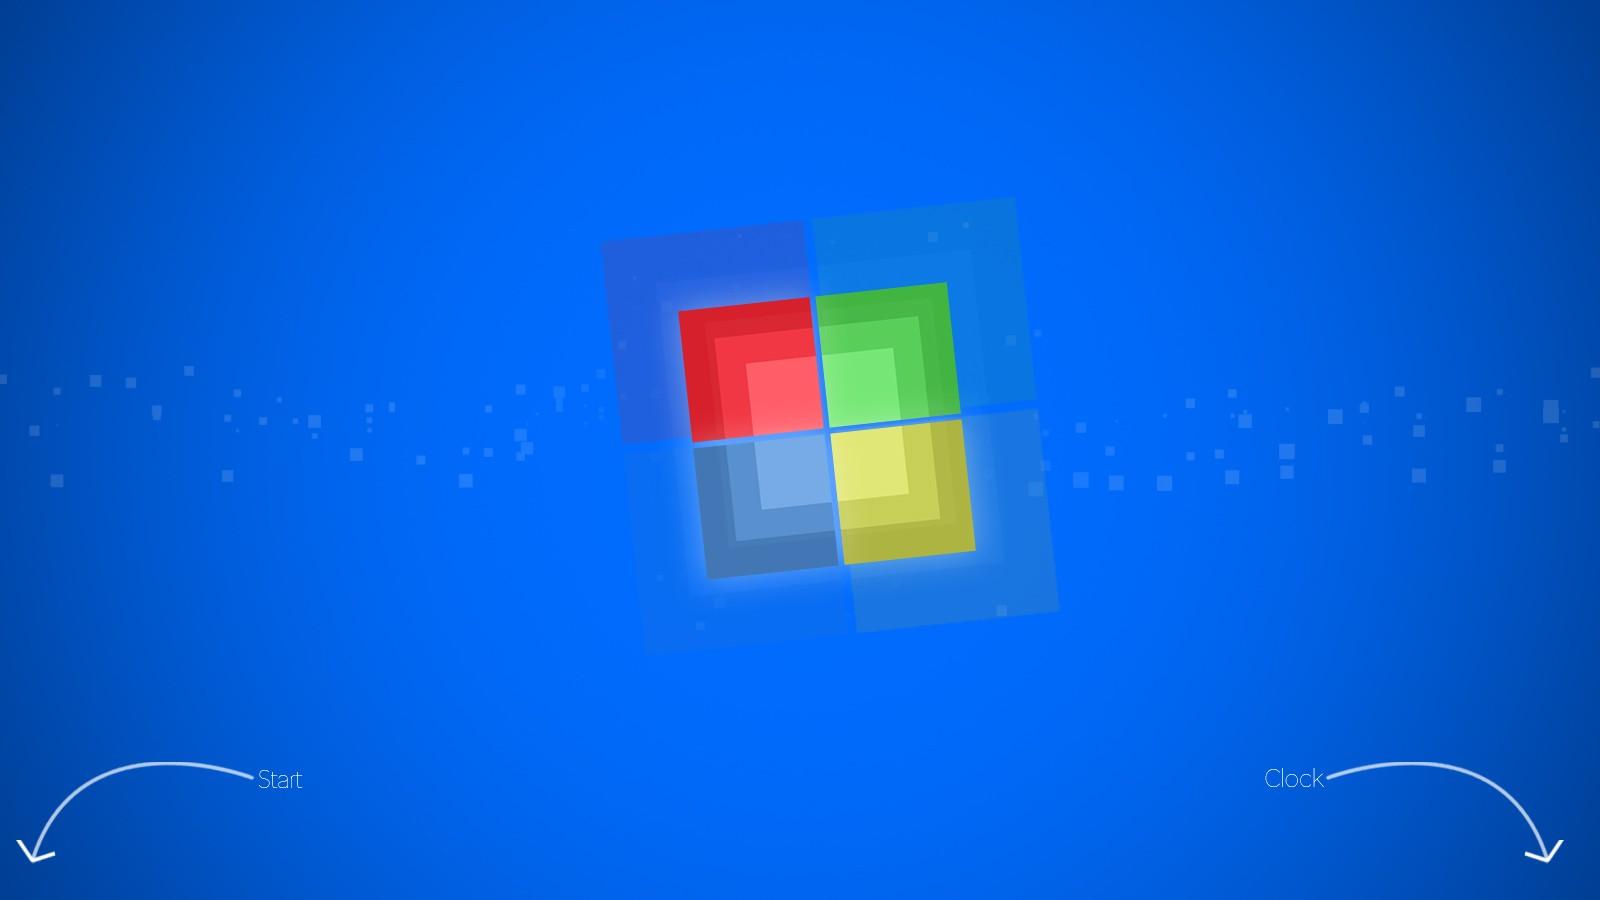 Windows 7 Wallpaper 1600x900 Windows 7 1600x900